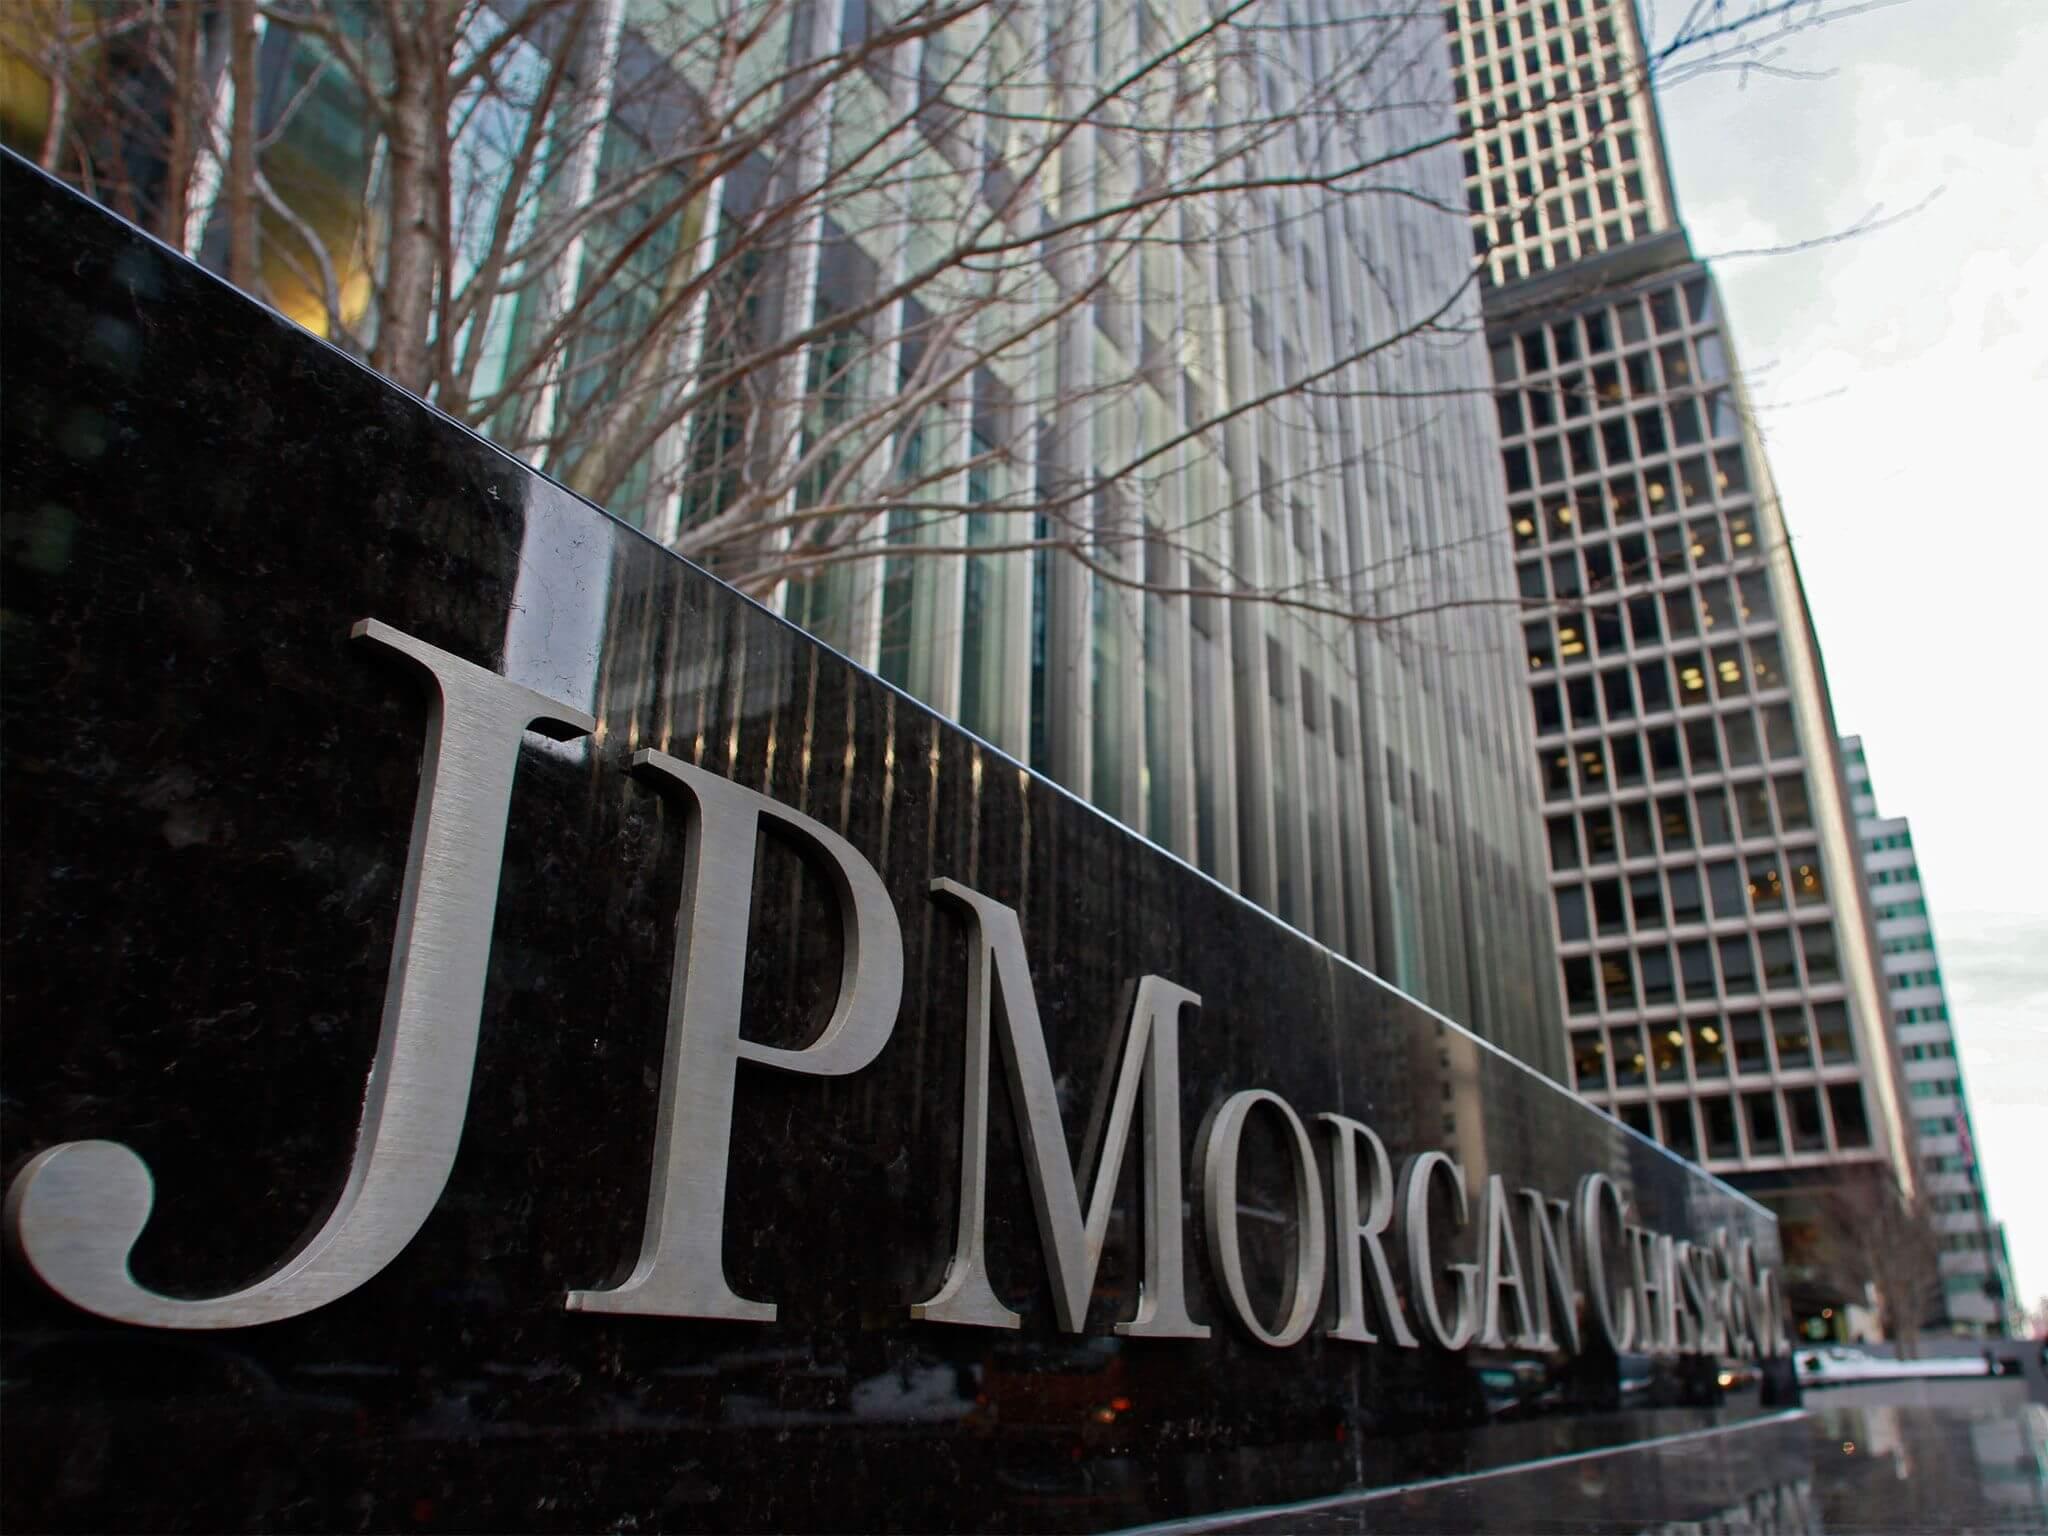 JPMorgan Chase выступает за развитие блокчейн